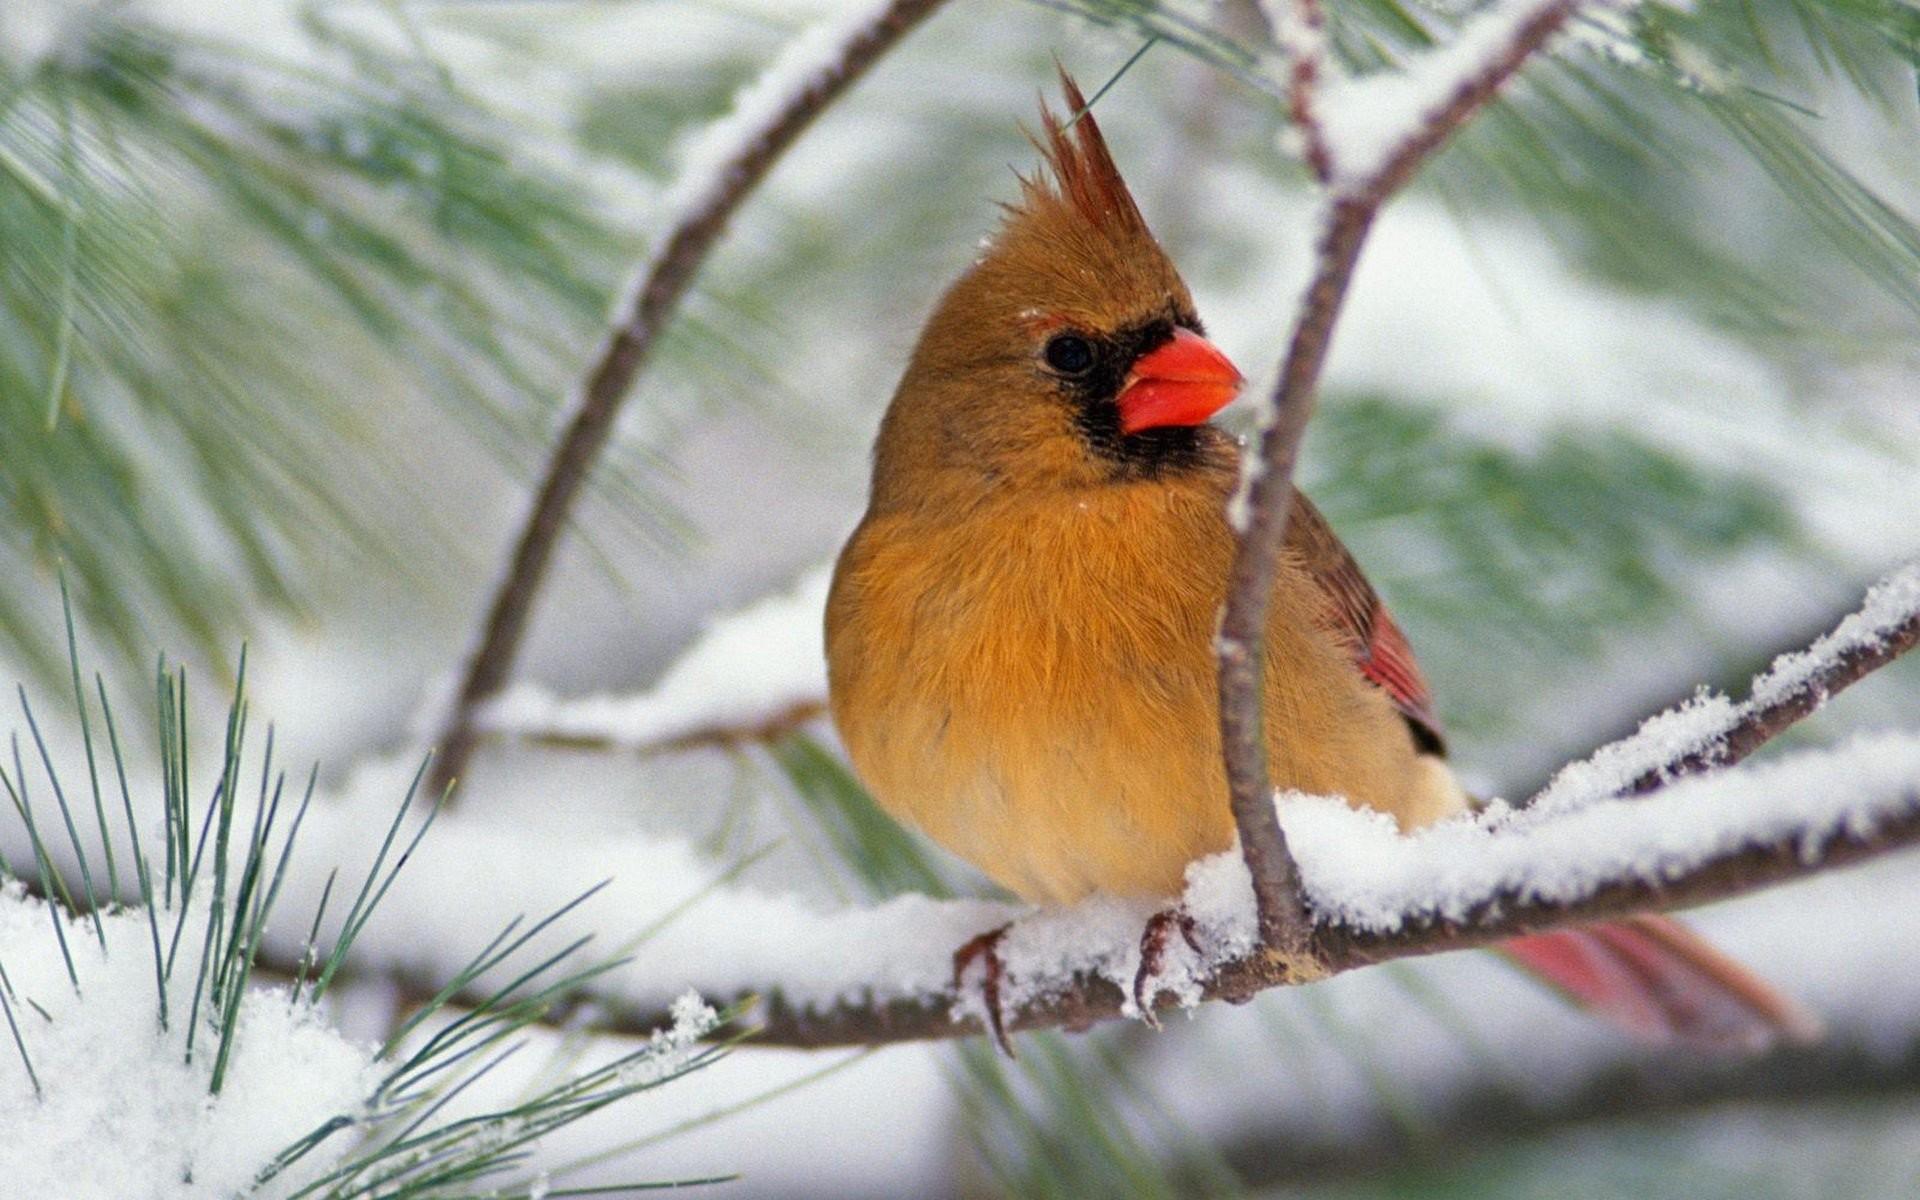 Snow birds animals branches Northern Cardinal wallpaper | |  263778 | WallpaperUP